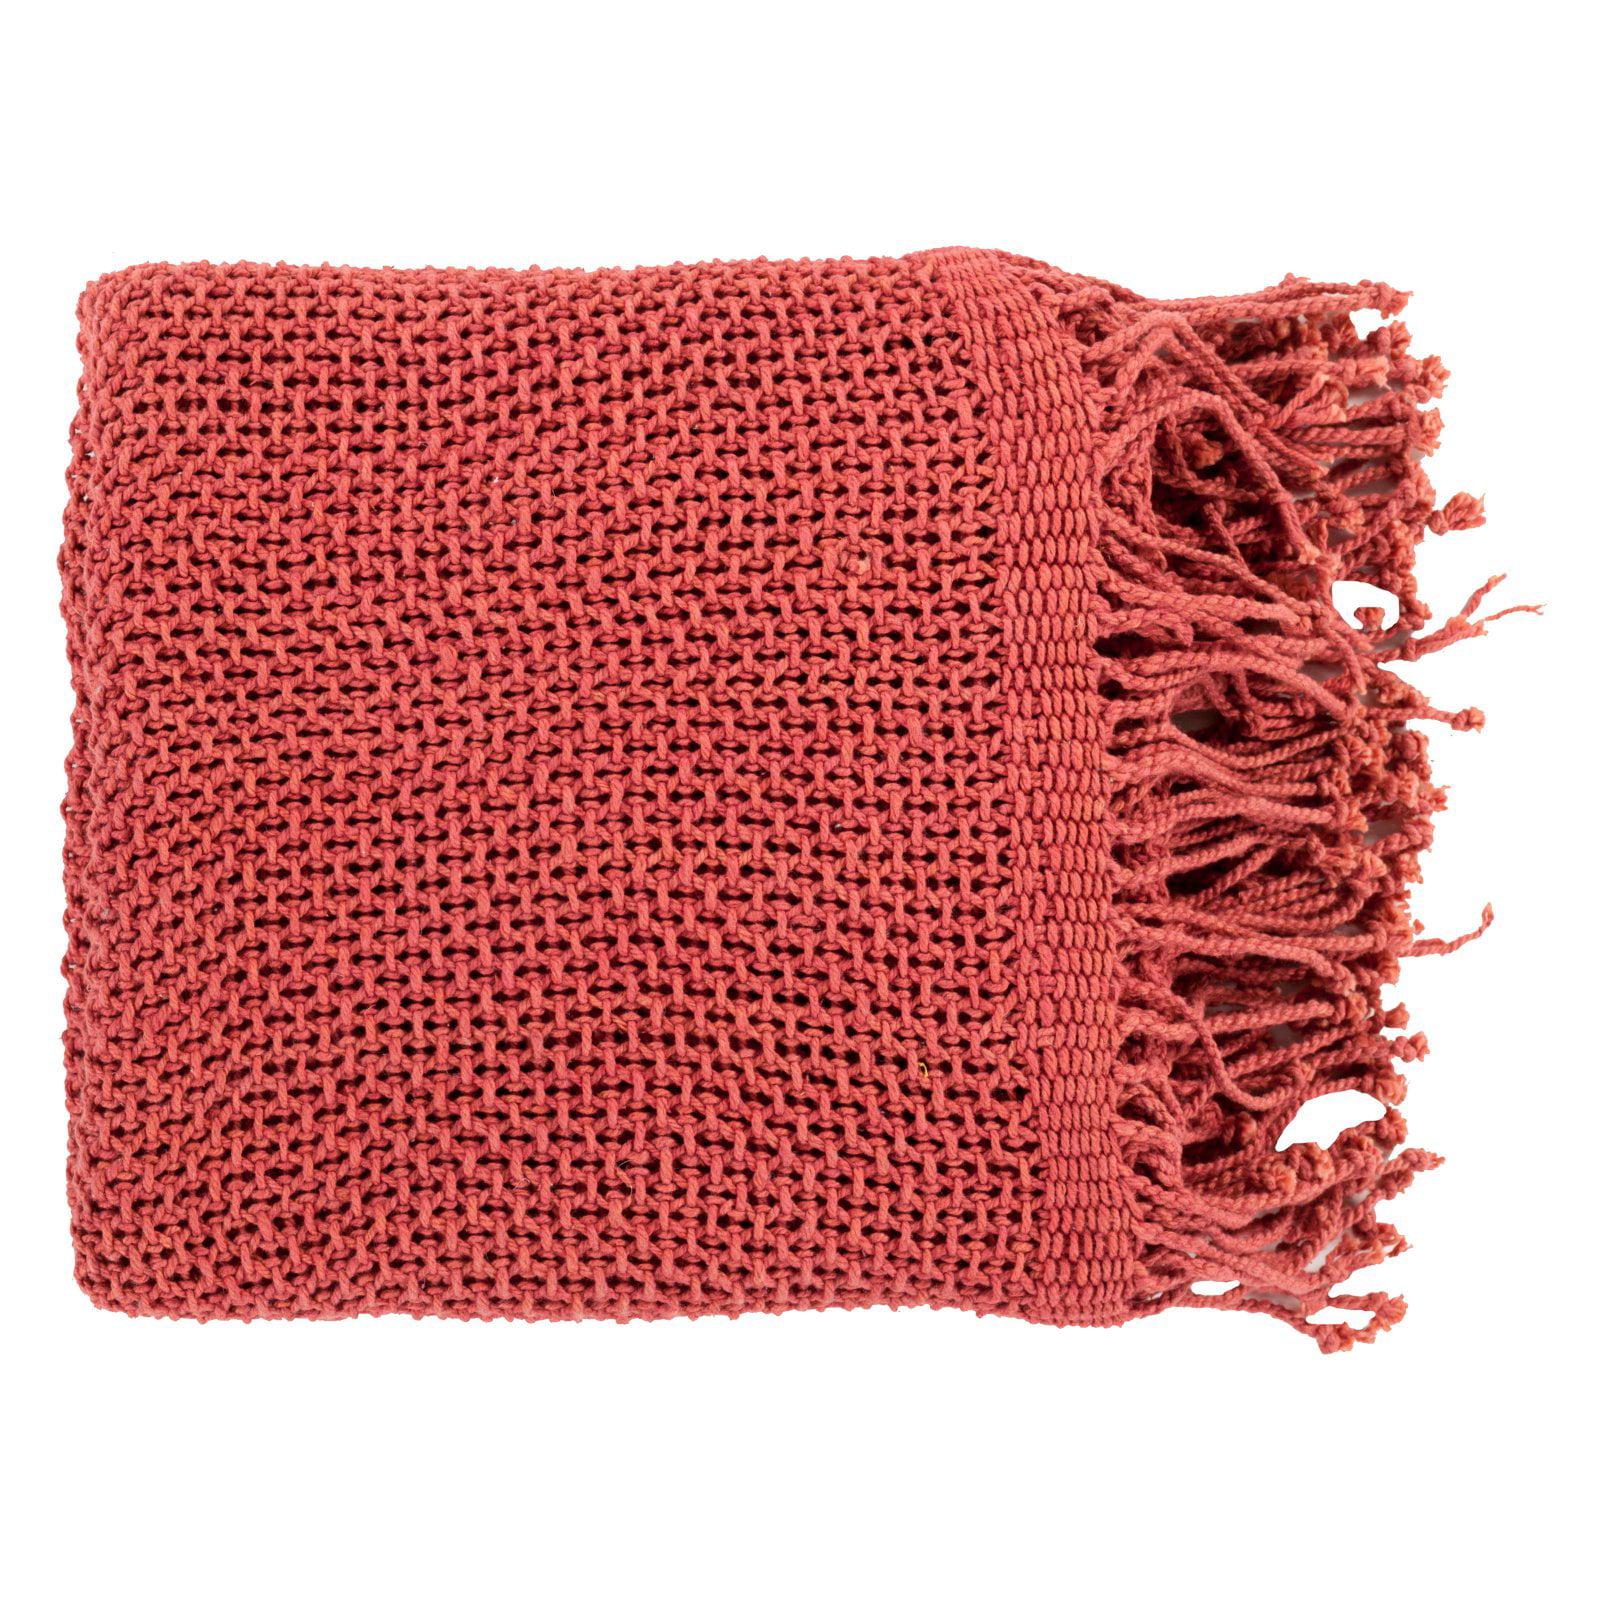 Surya Tibey Cotton Throw Blanket